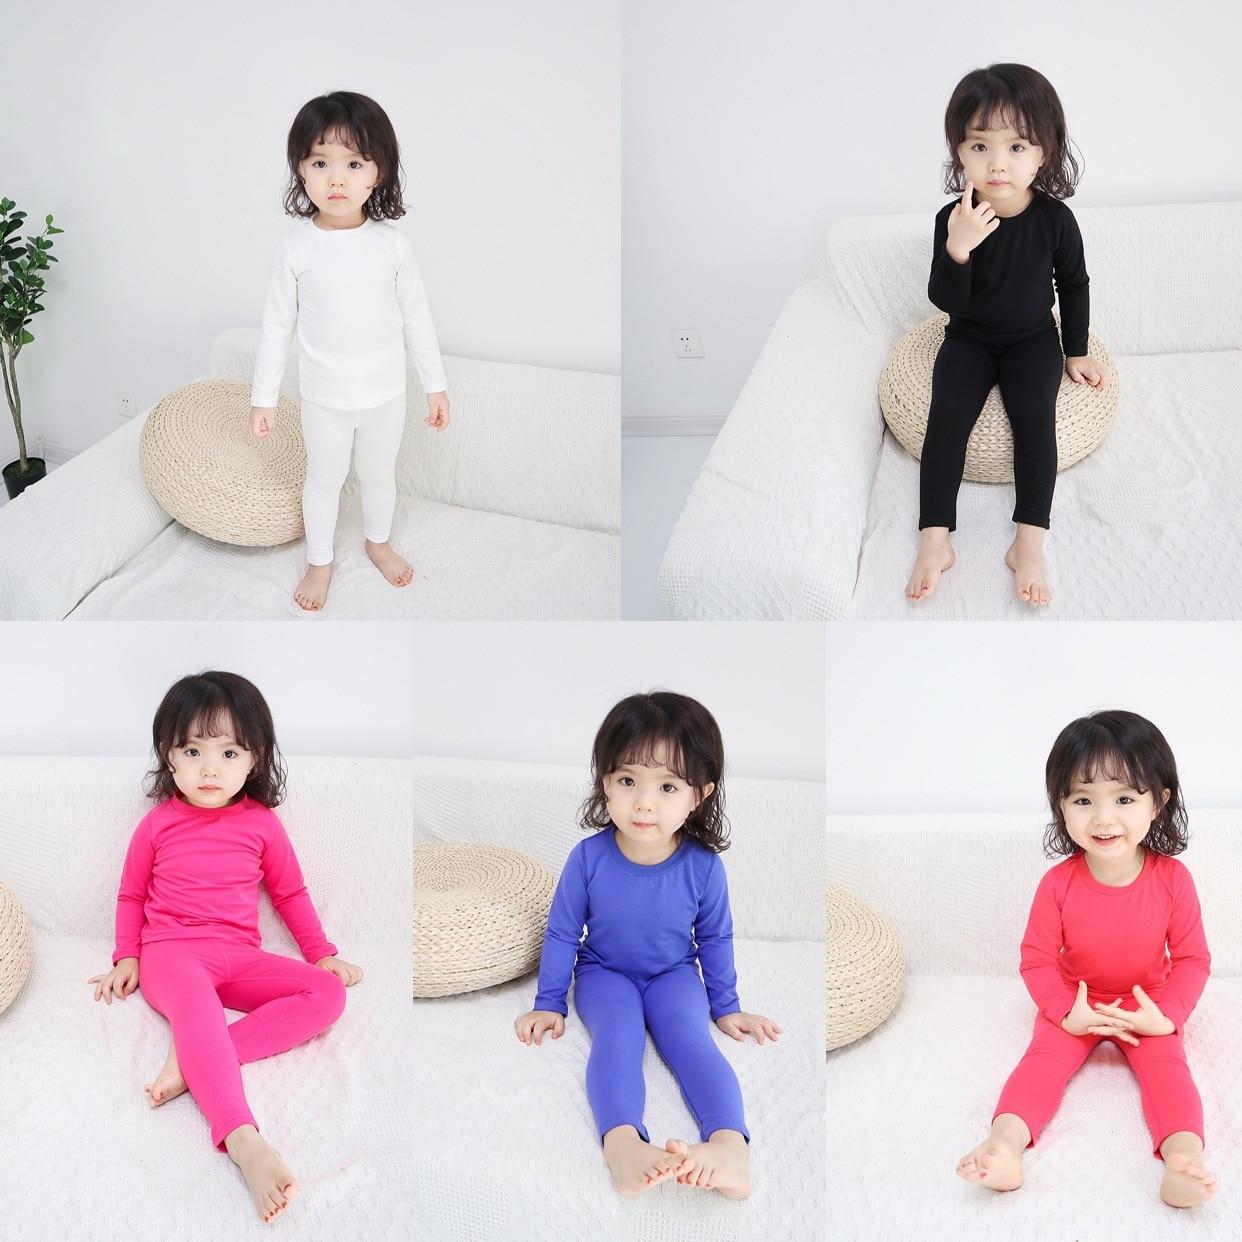 2019 Spring Children Tracksuit South Korea Childrenswear BOY'S Girls Thermal Underwear Cotton Baby Pajamas